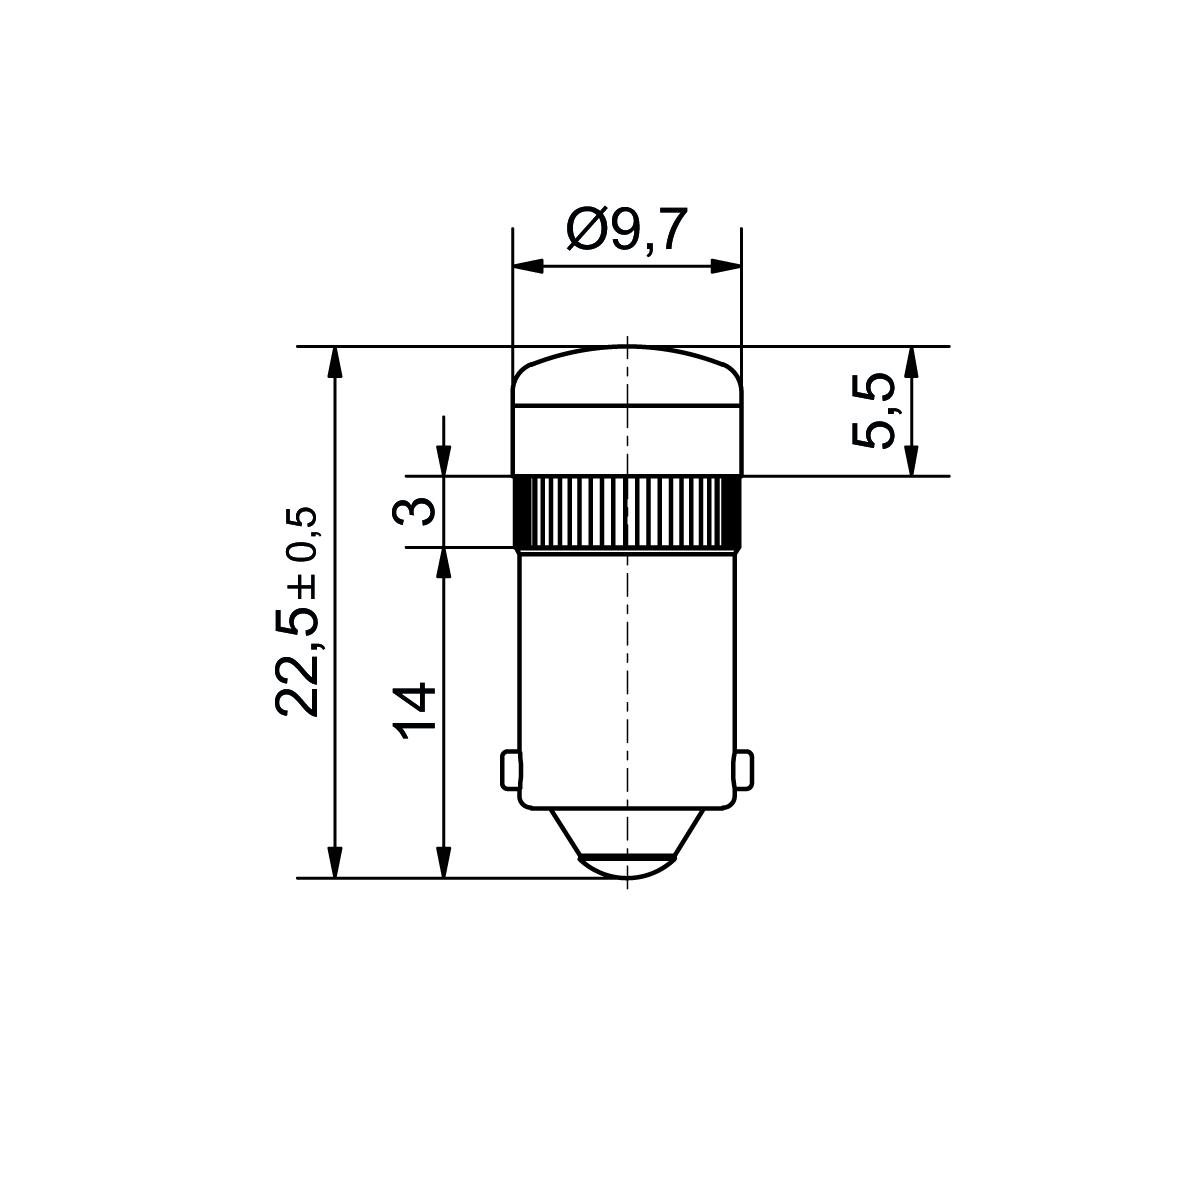 Multi-Look® LED lamp socket BA9s 130/230V AC/DC - plan